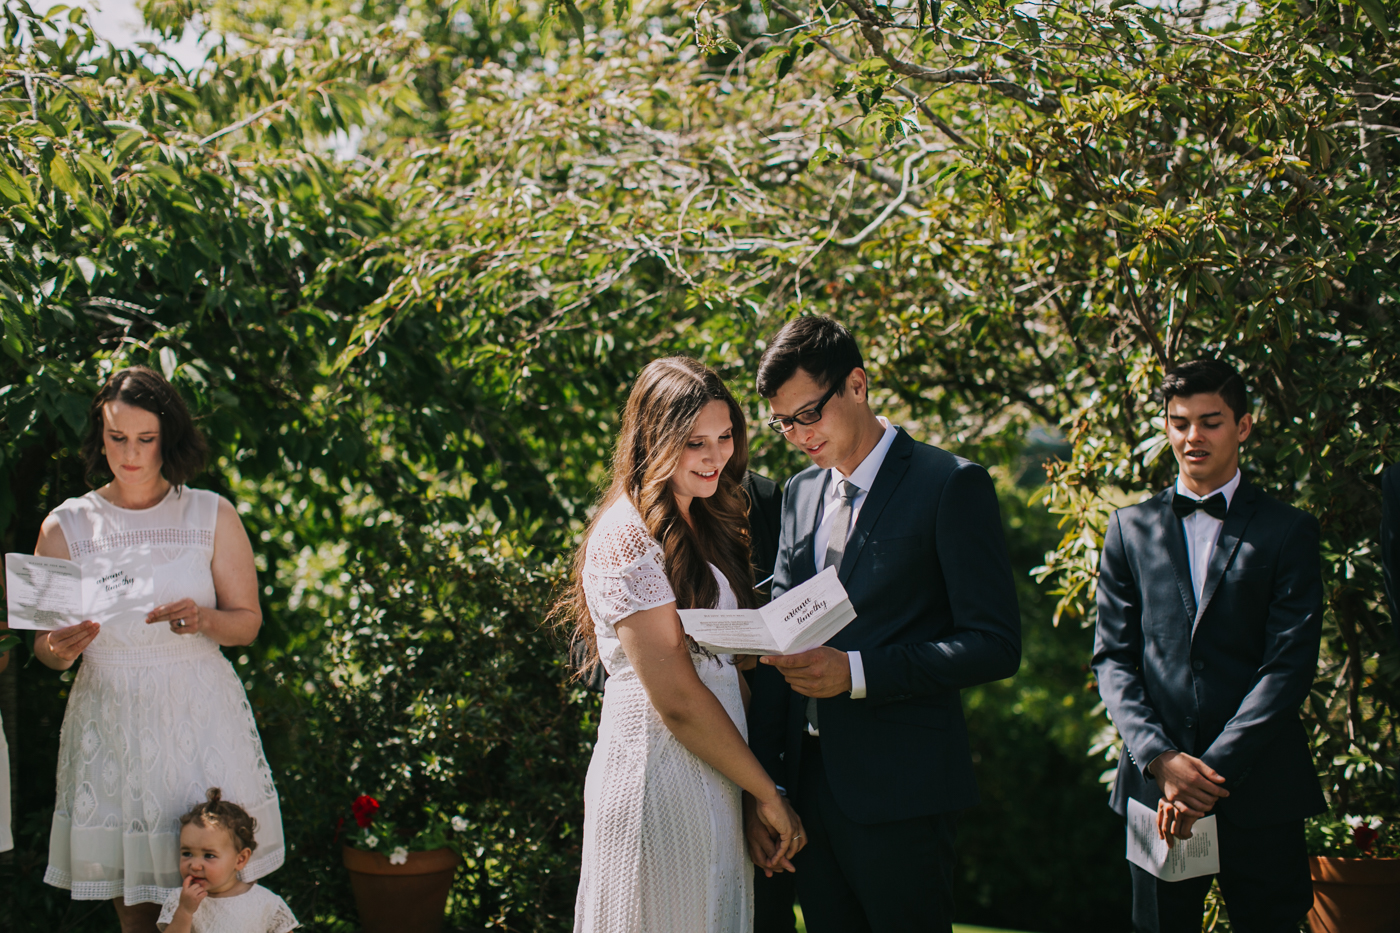 Ariana & Tim - Dunedin, New Zealand Wedding - Destination Wedding - Samantha Heather Photography-90.jpg